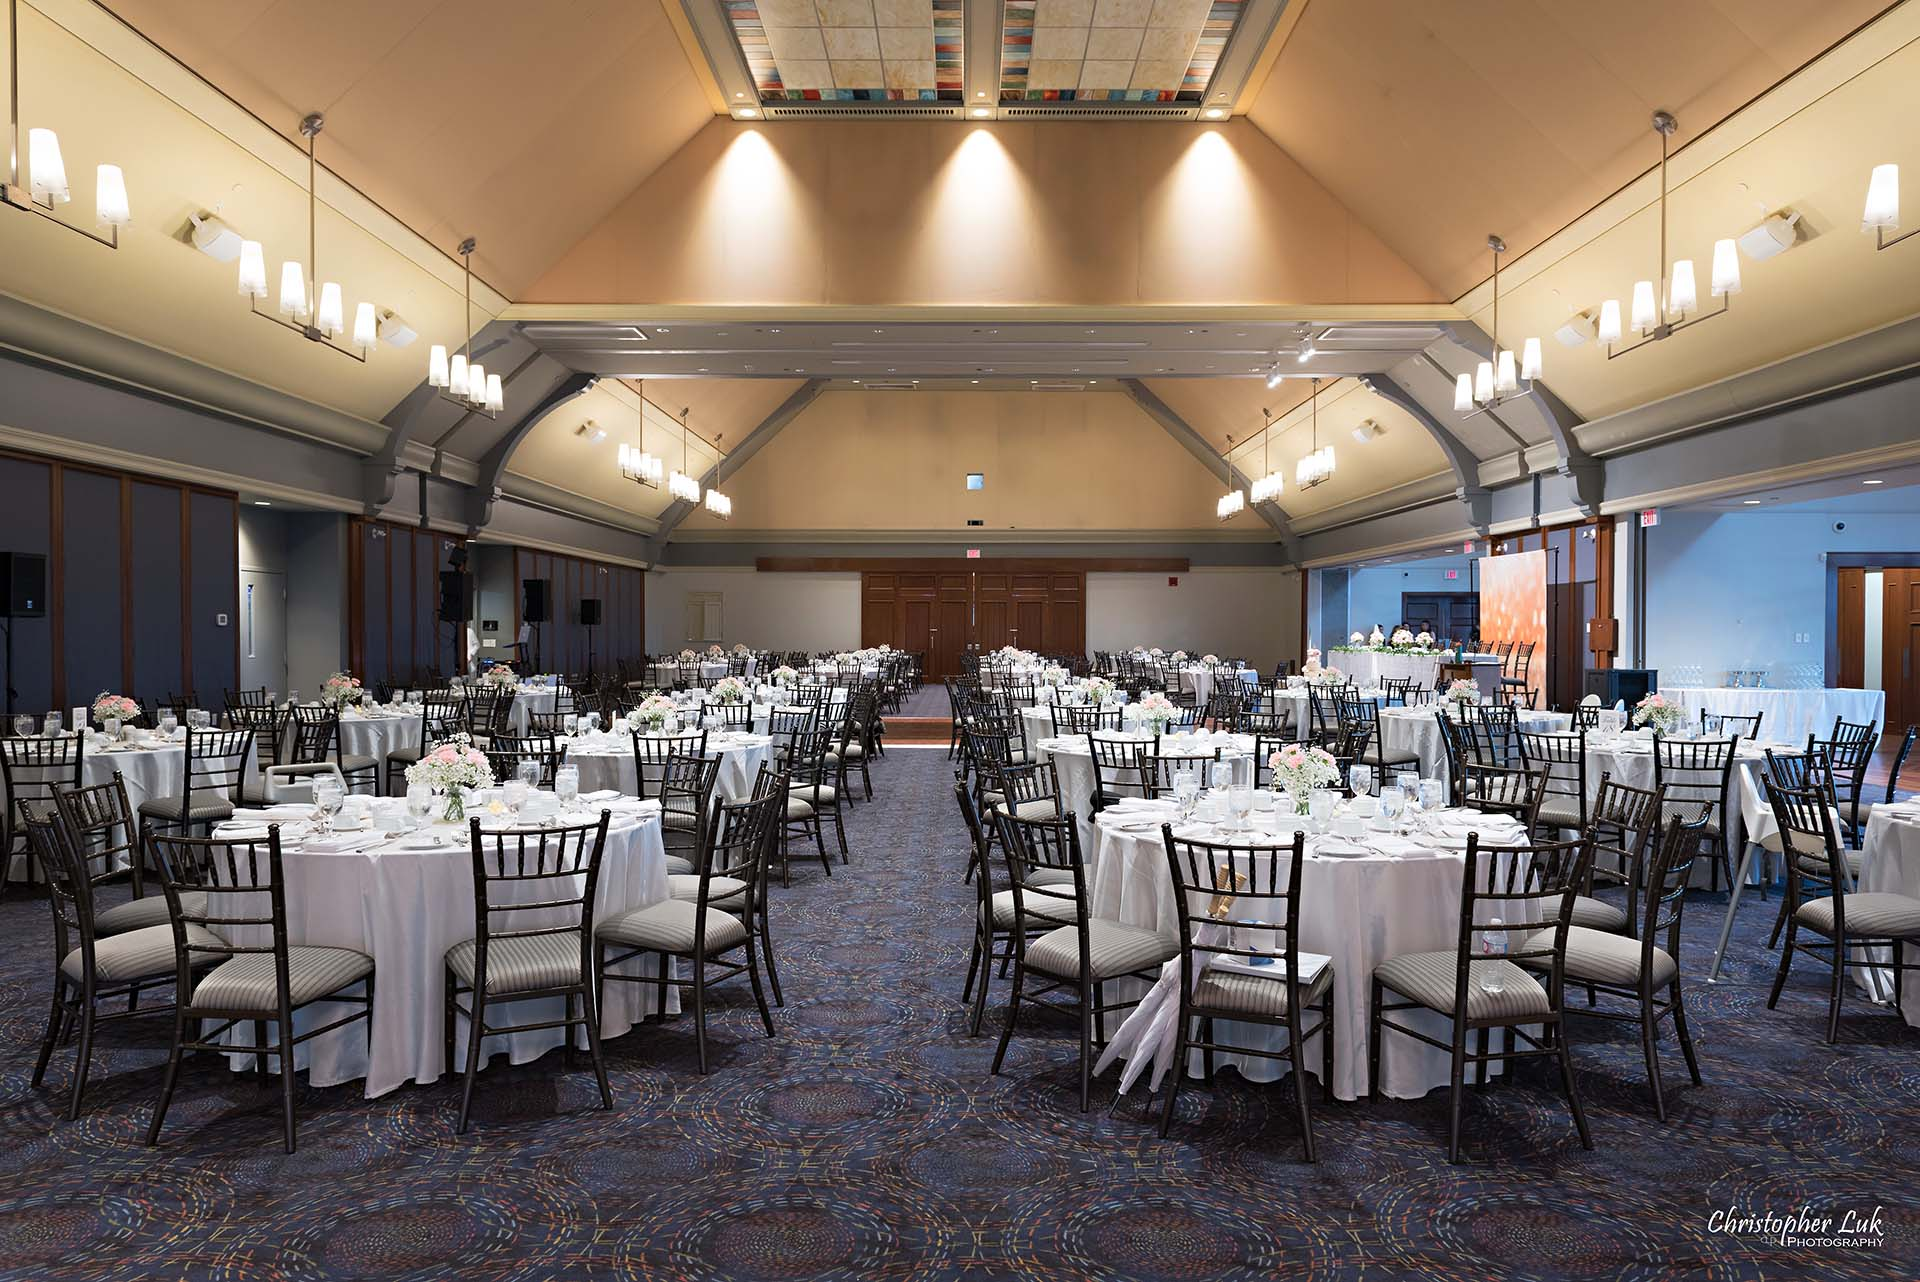 Christopher Luk Toronto Wedding Photographer Angus Glen Golf Club Markham Great Hall Dinner Reception Event Venue Round Tables Chiavari Chairs Wide Room Lobby Entrance